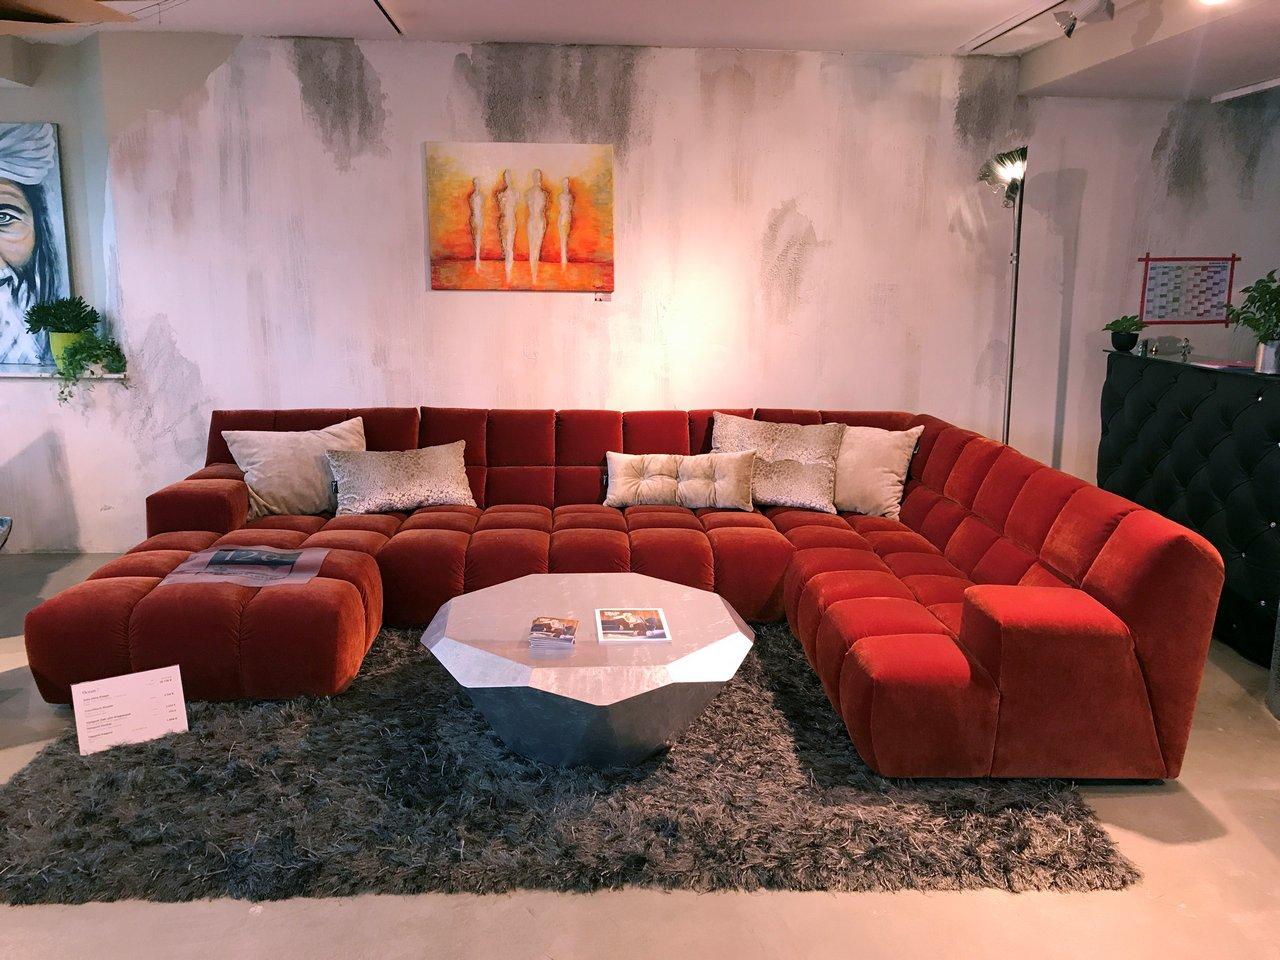 Bretz Store am Theater Dortmund – Manufaktur Bretz